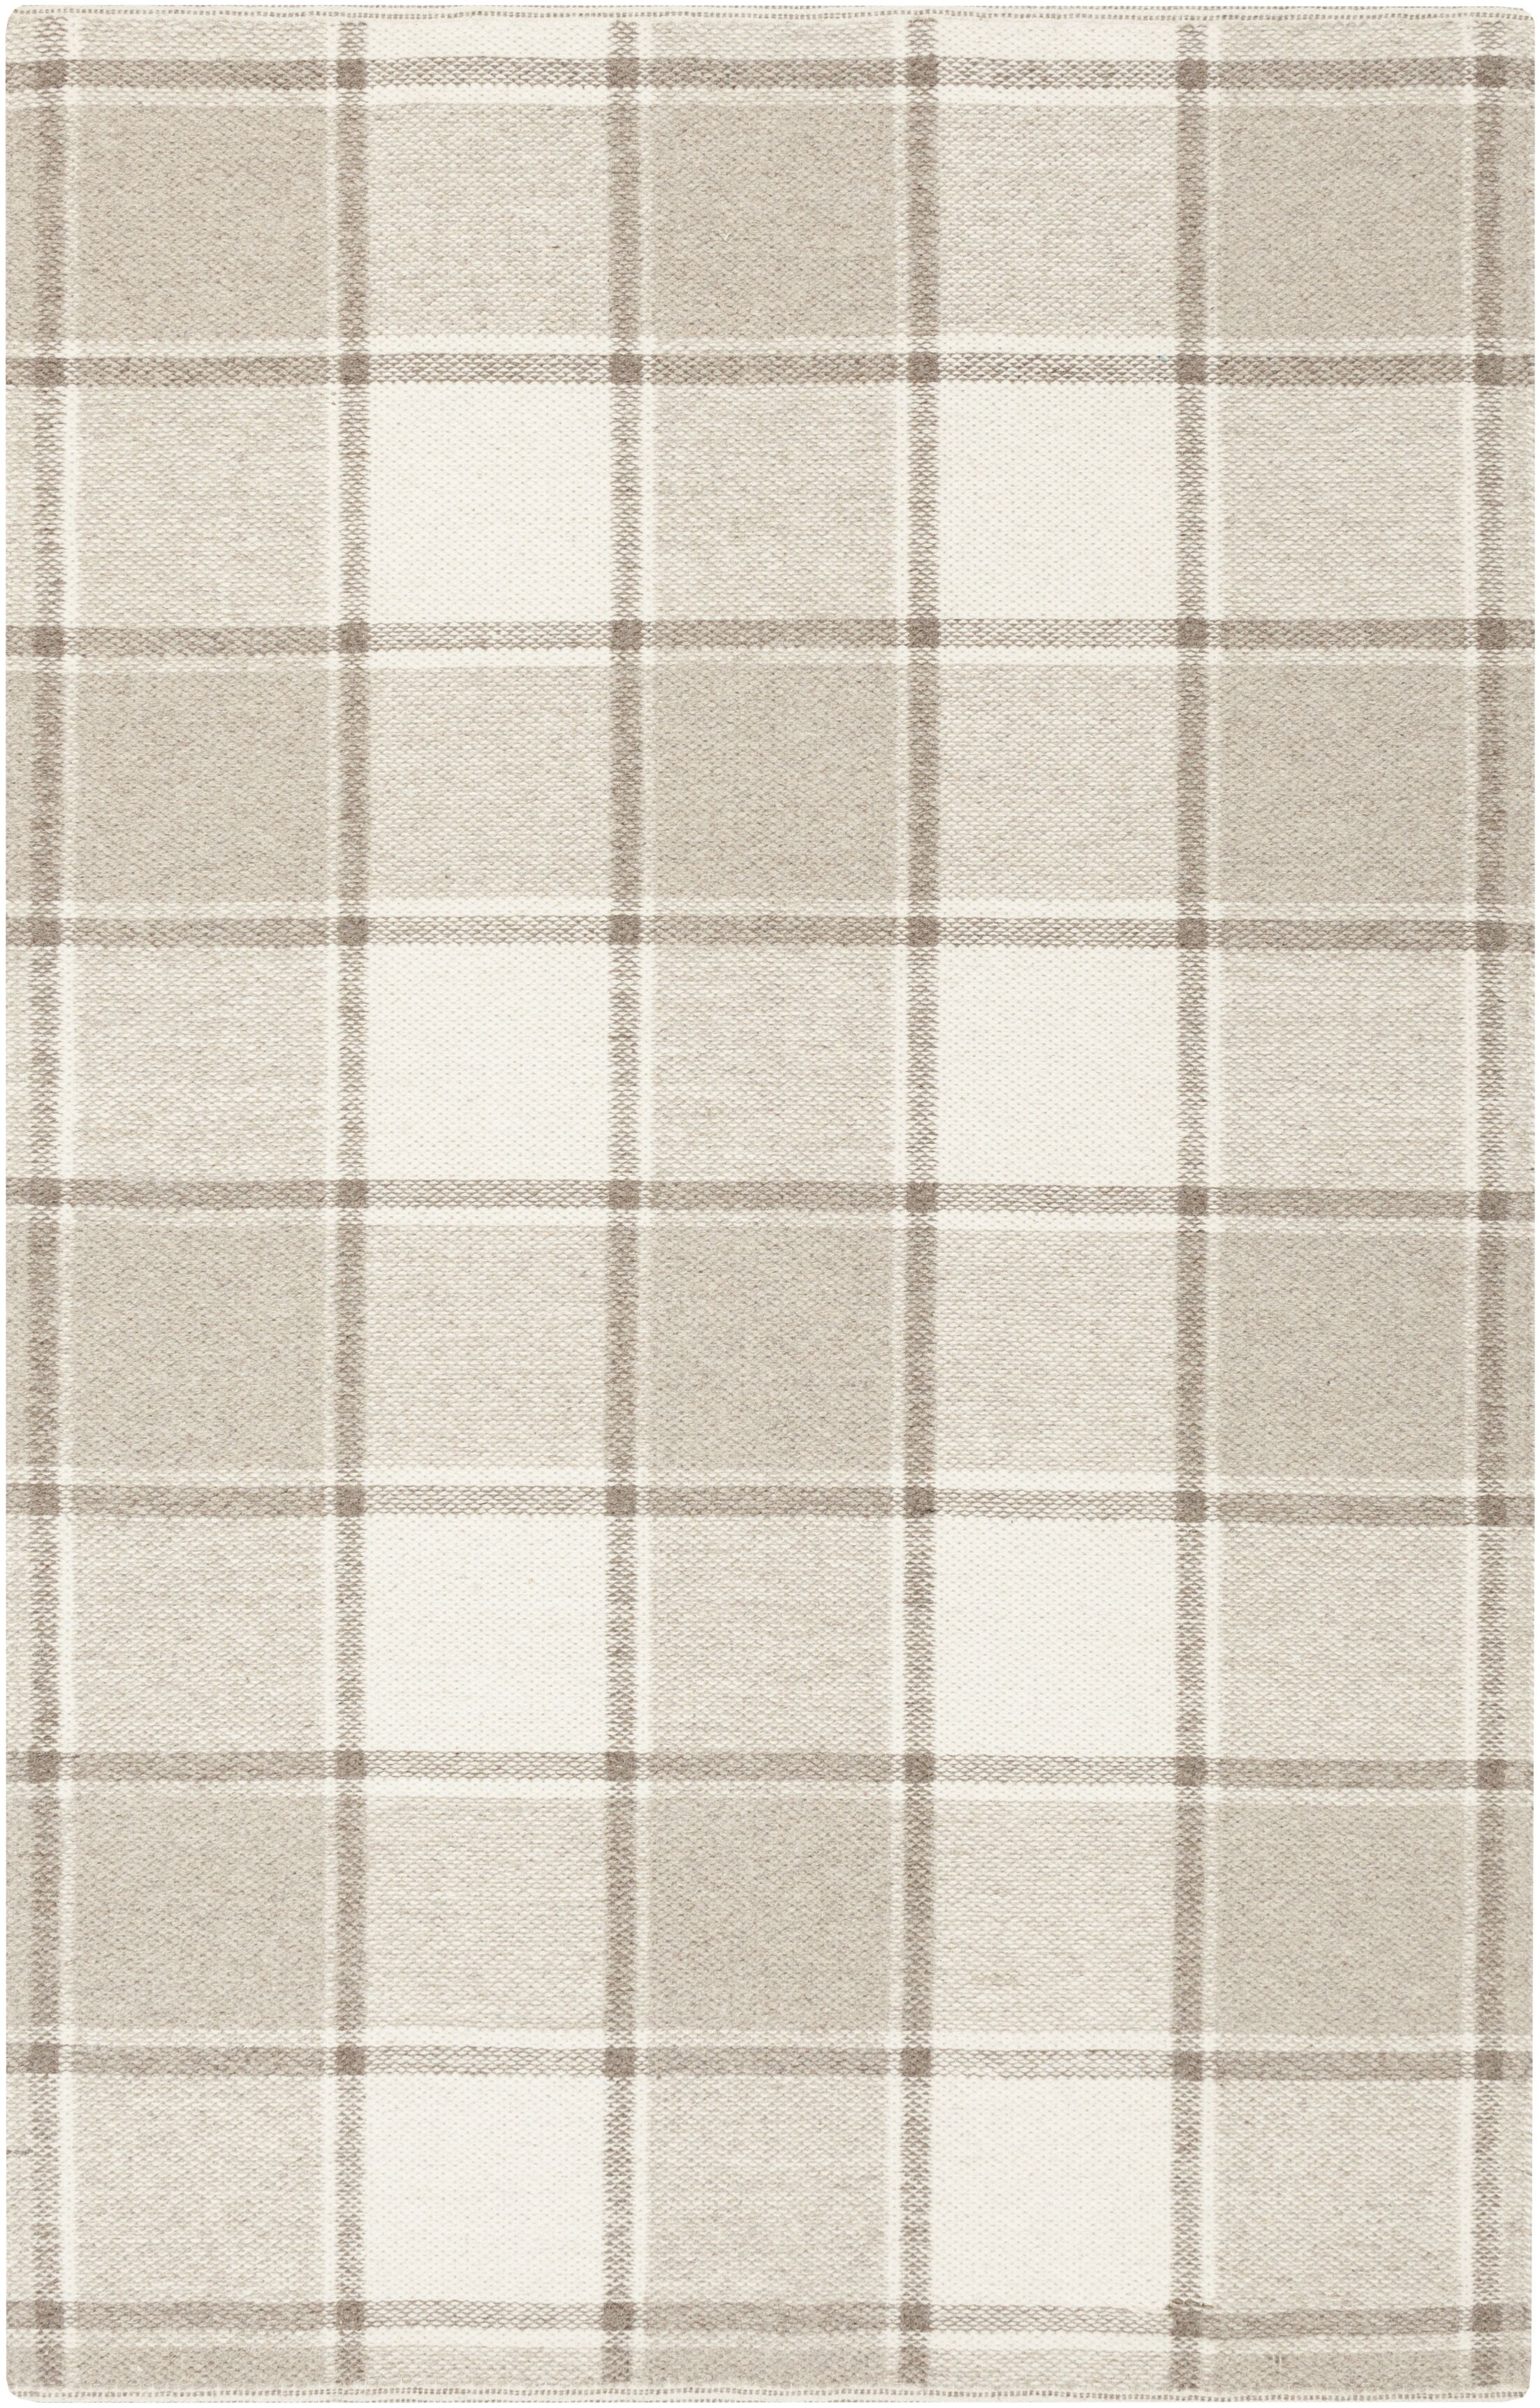 Carnkeeran Lakewood Hand-Woven Gray Area Rug Rug Size: 8' x 10'